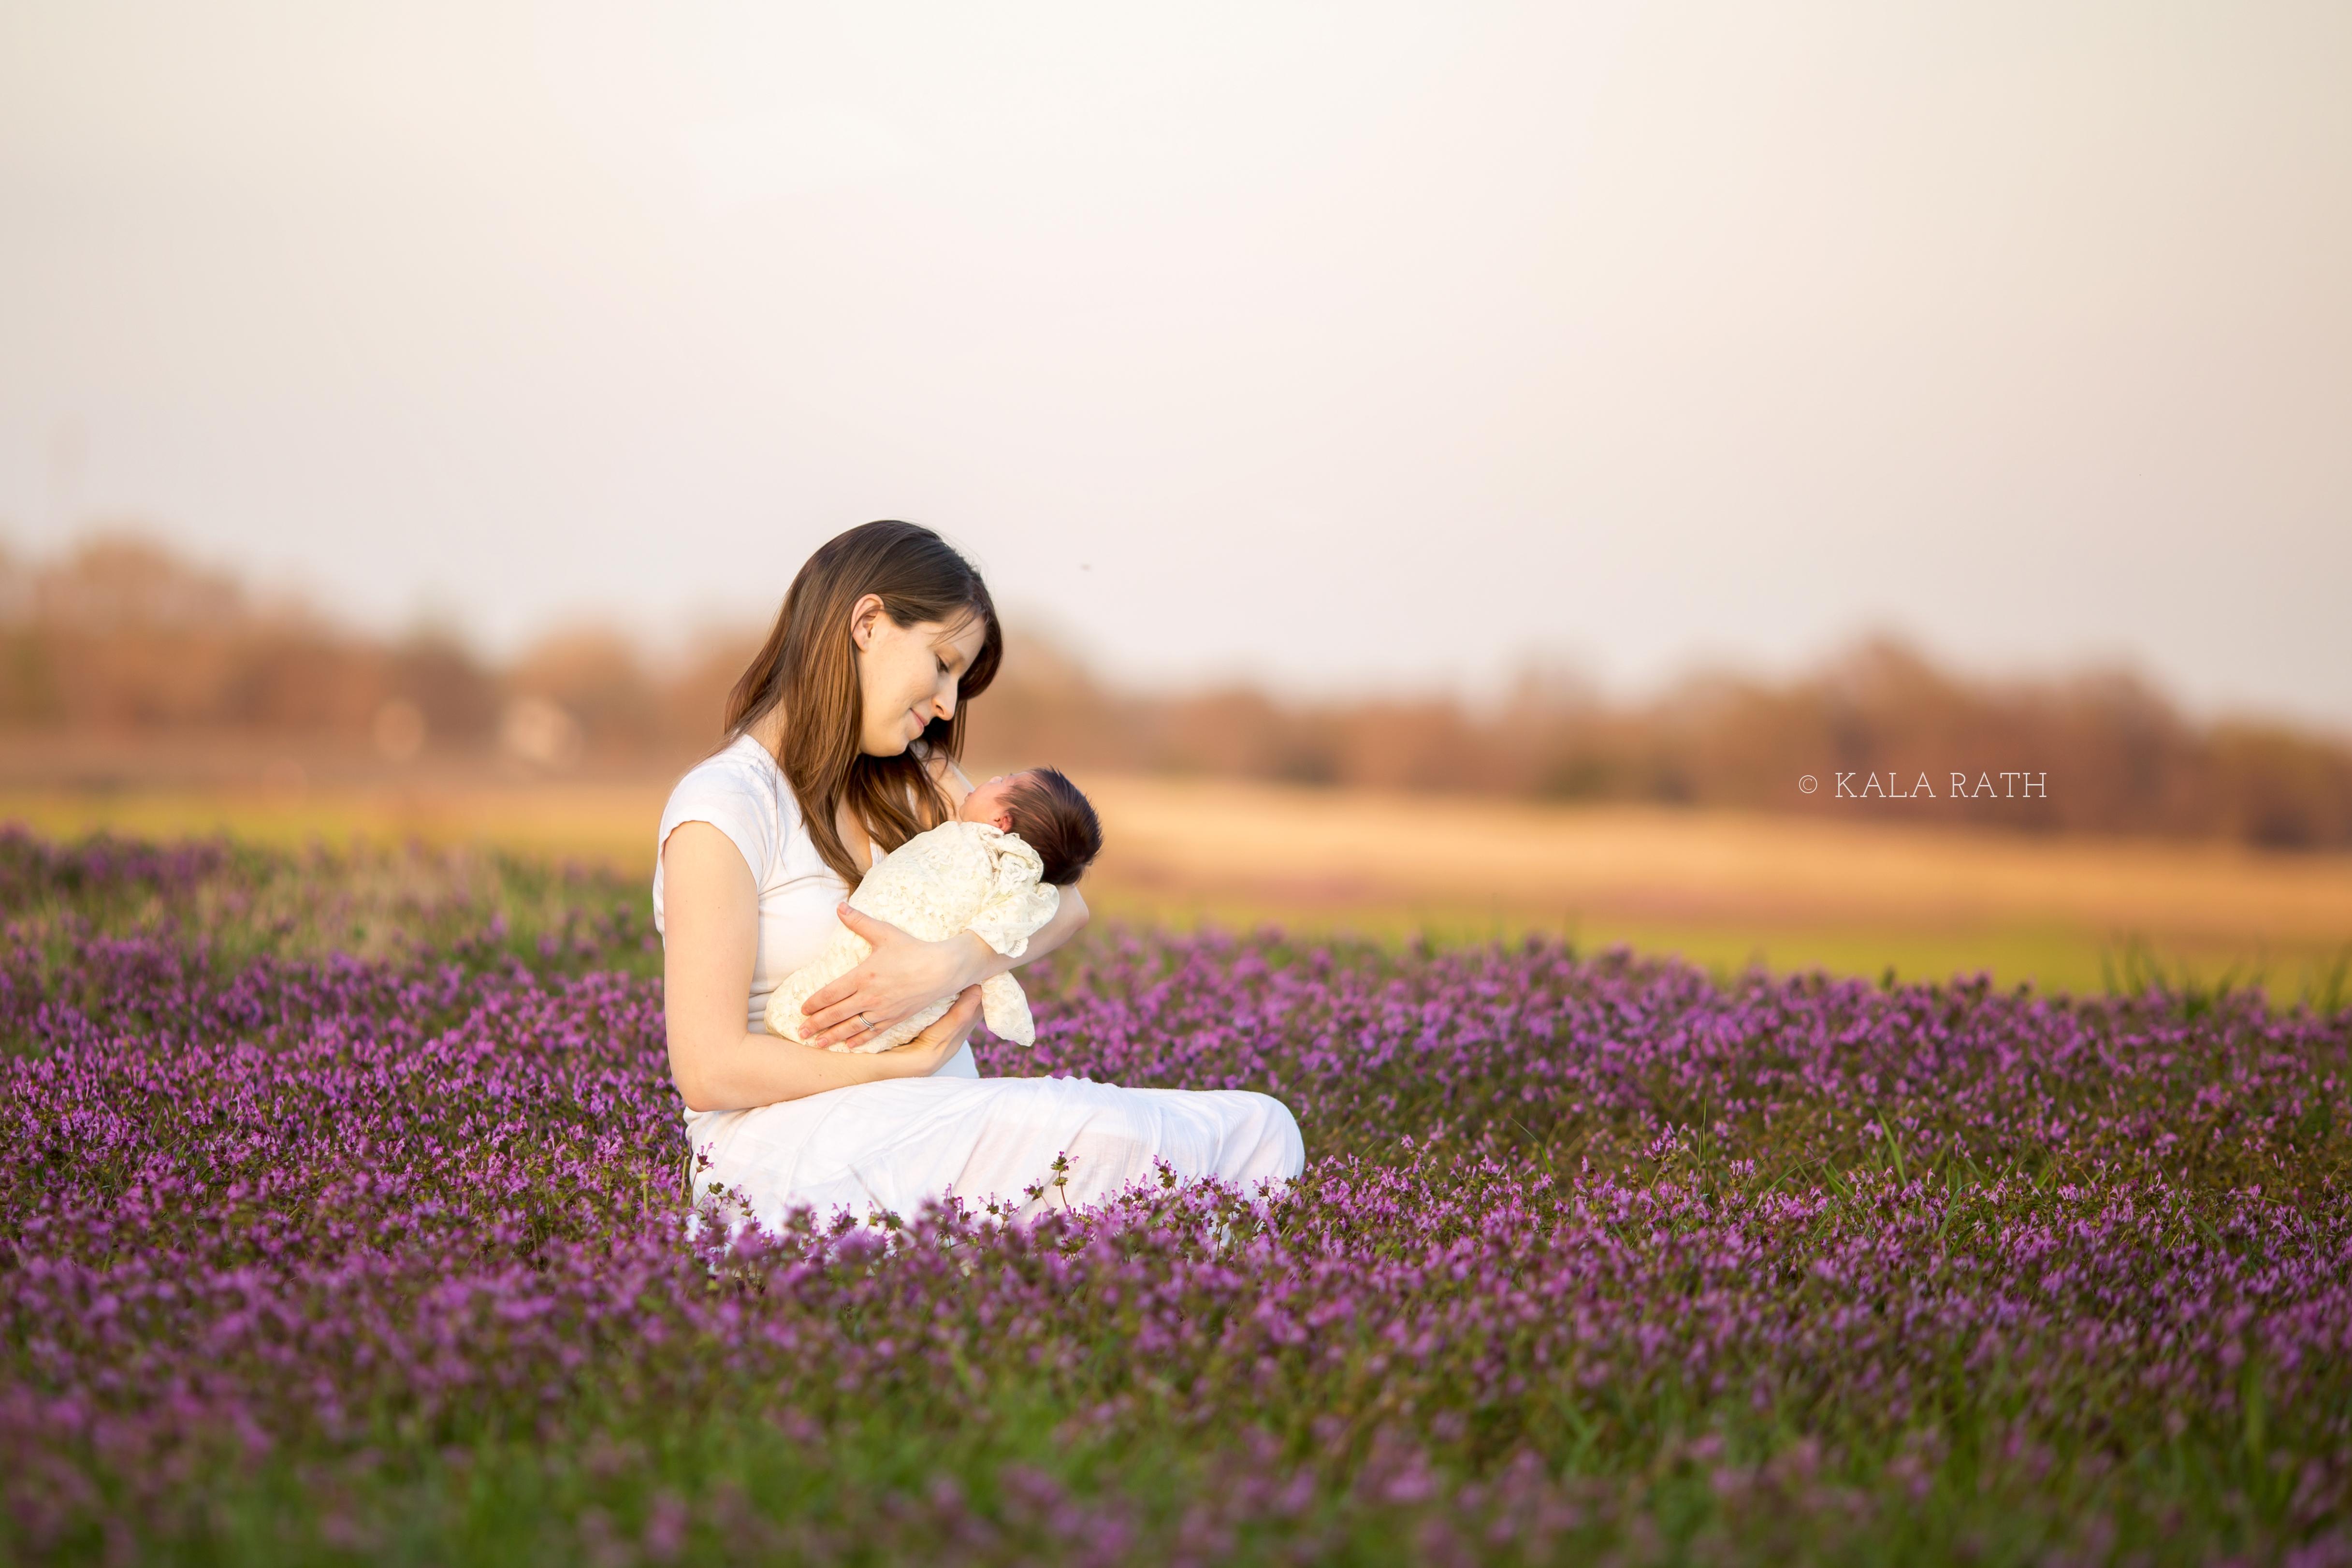 Fort Smith Newborn Photographer - Kala Rath Photography